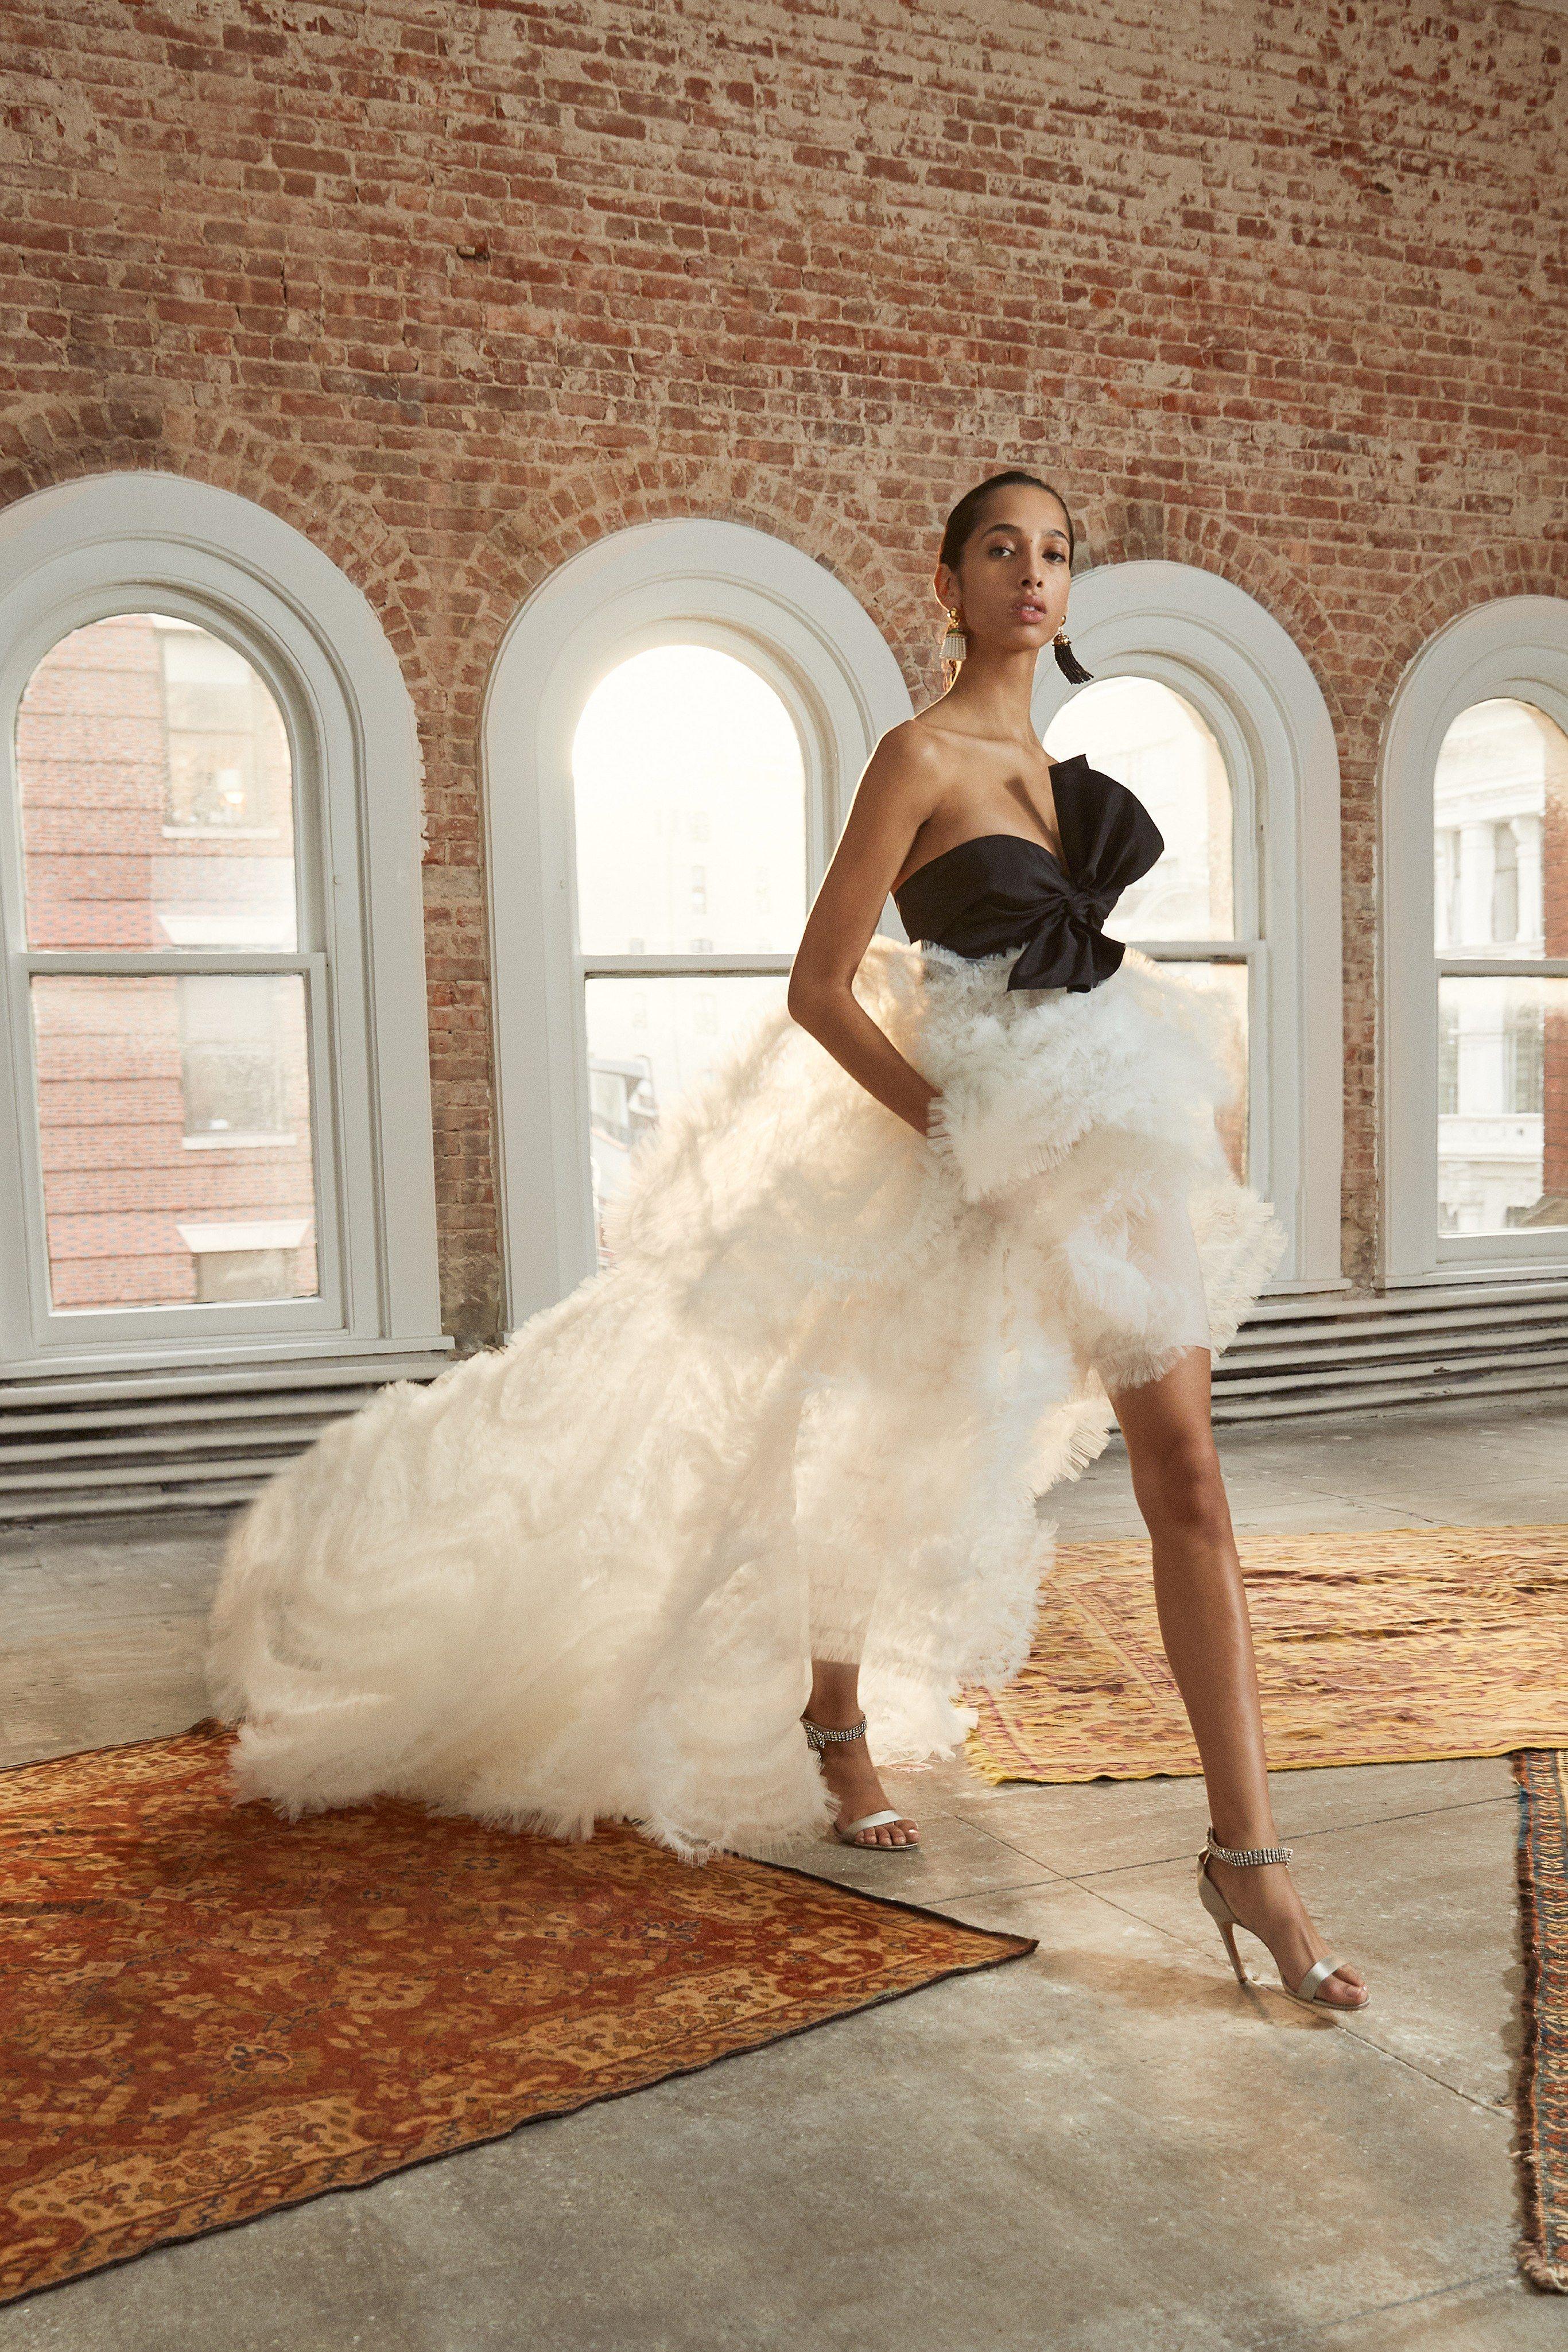 a3de8ec307c Beach Wedding Dresses - Bridal Gowns for a Beach Destination Wedding